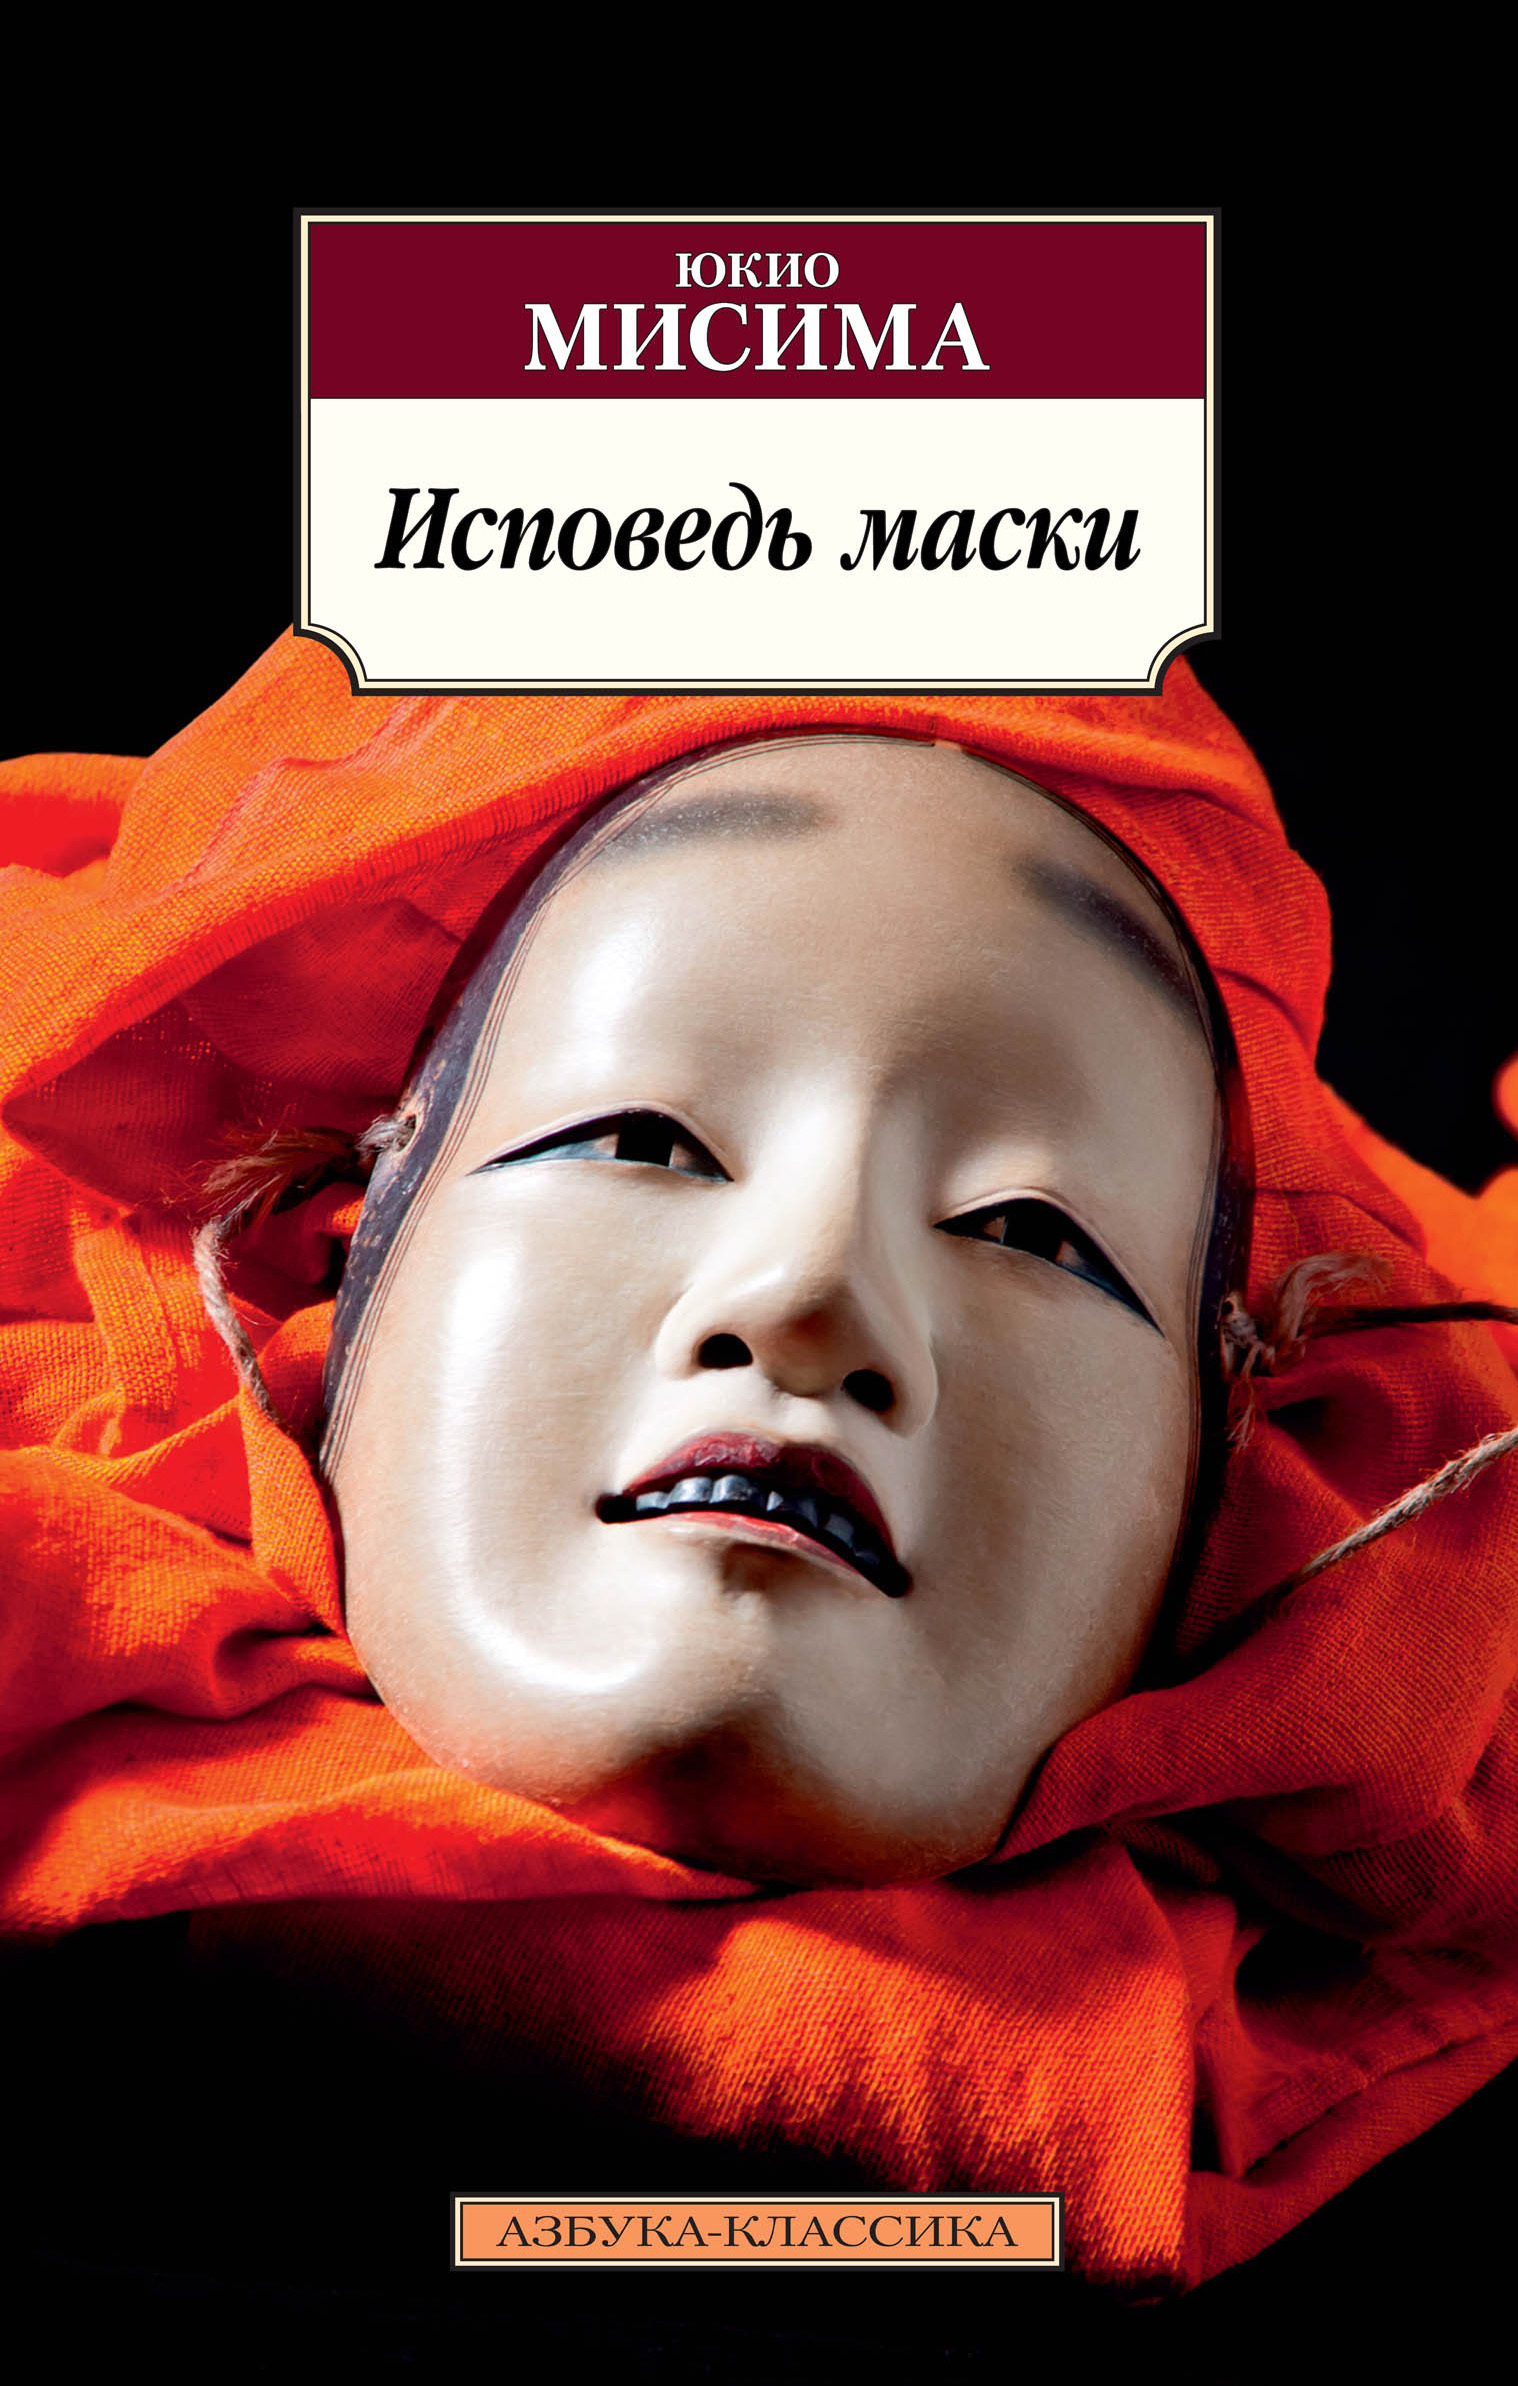 Юкио Мисима Исповедь маски